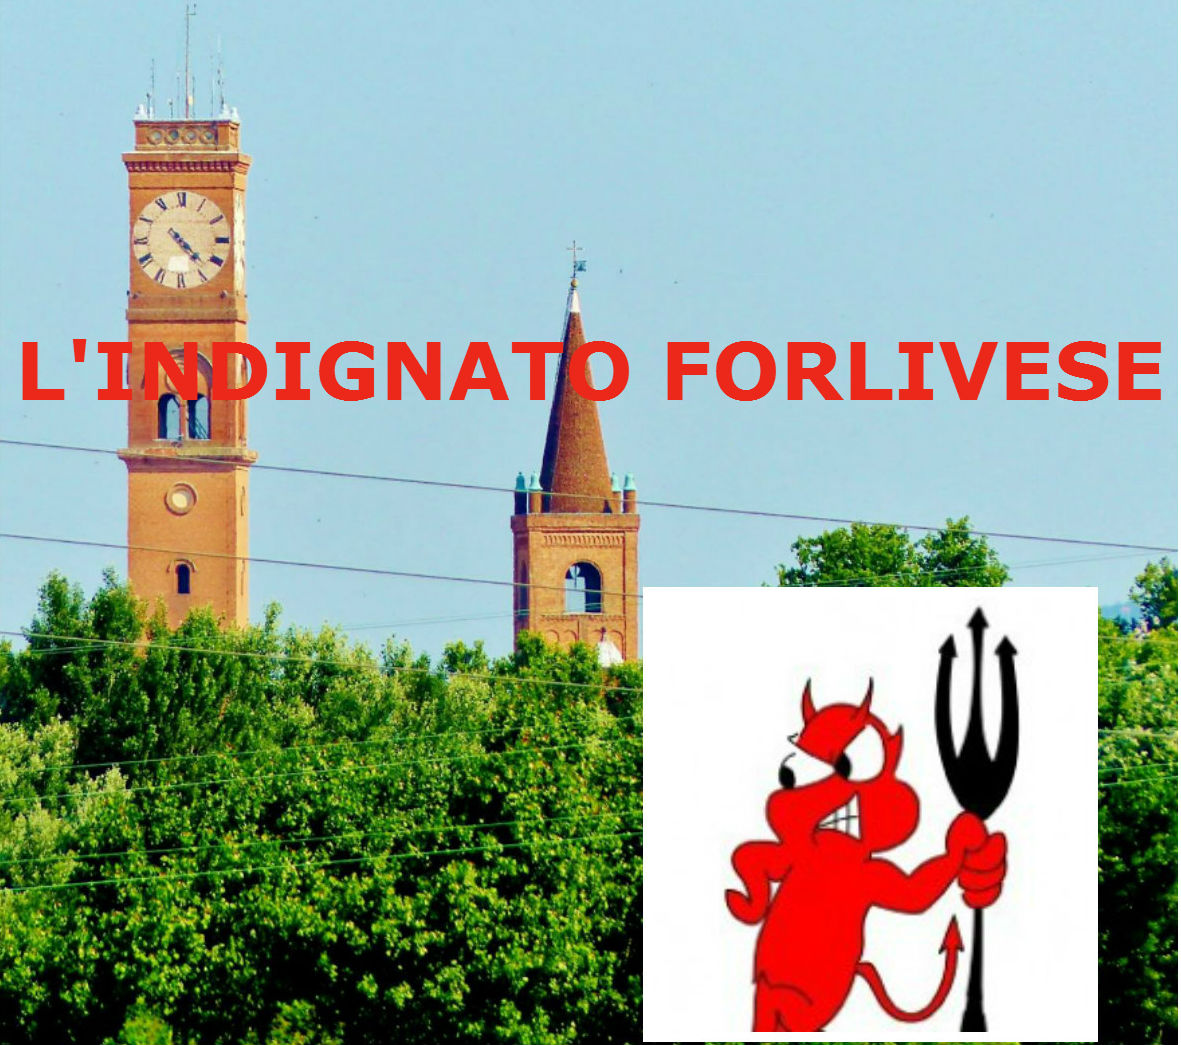 indignato forlivese